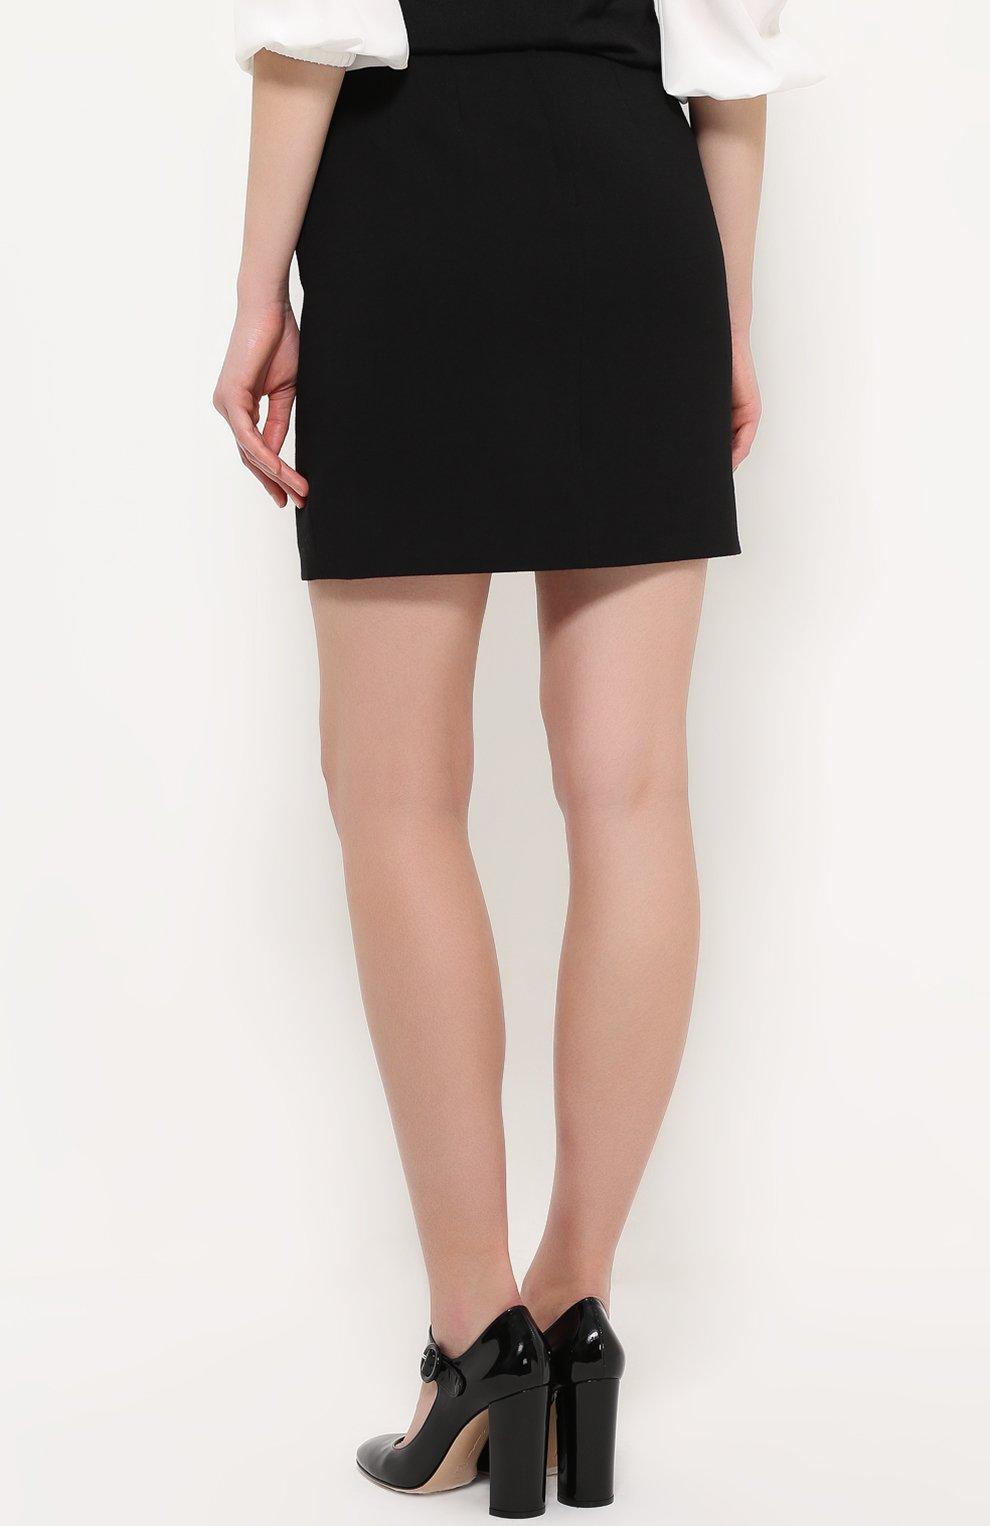 Мини-юбка с широким поясом Dolce & Gabbana черная | Фото №4